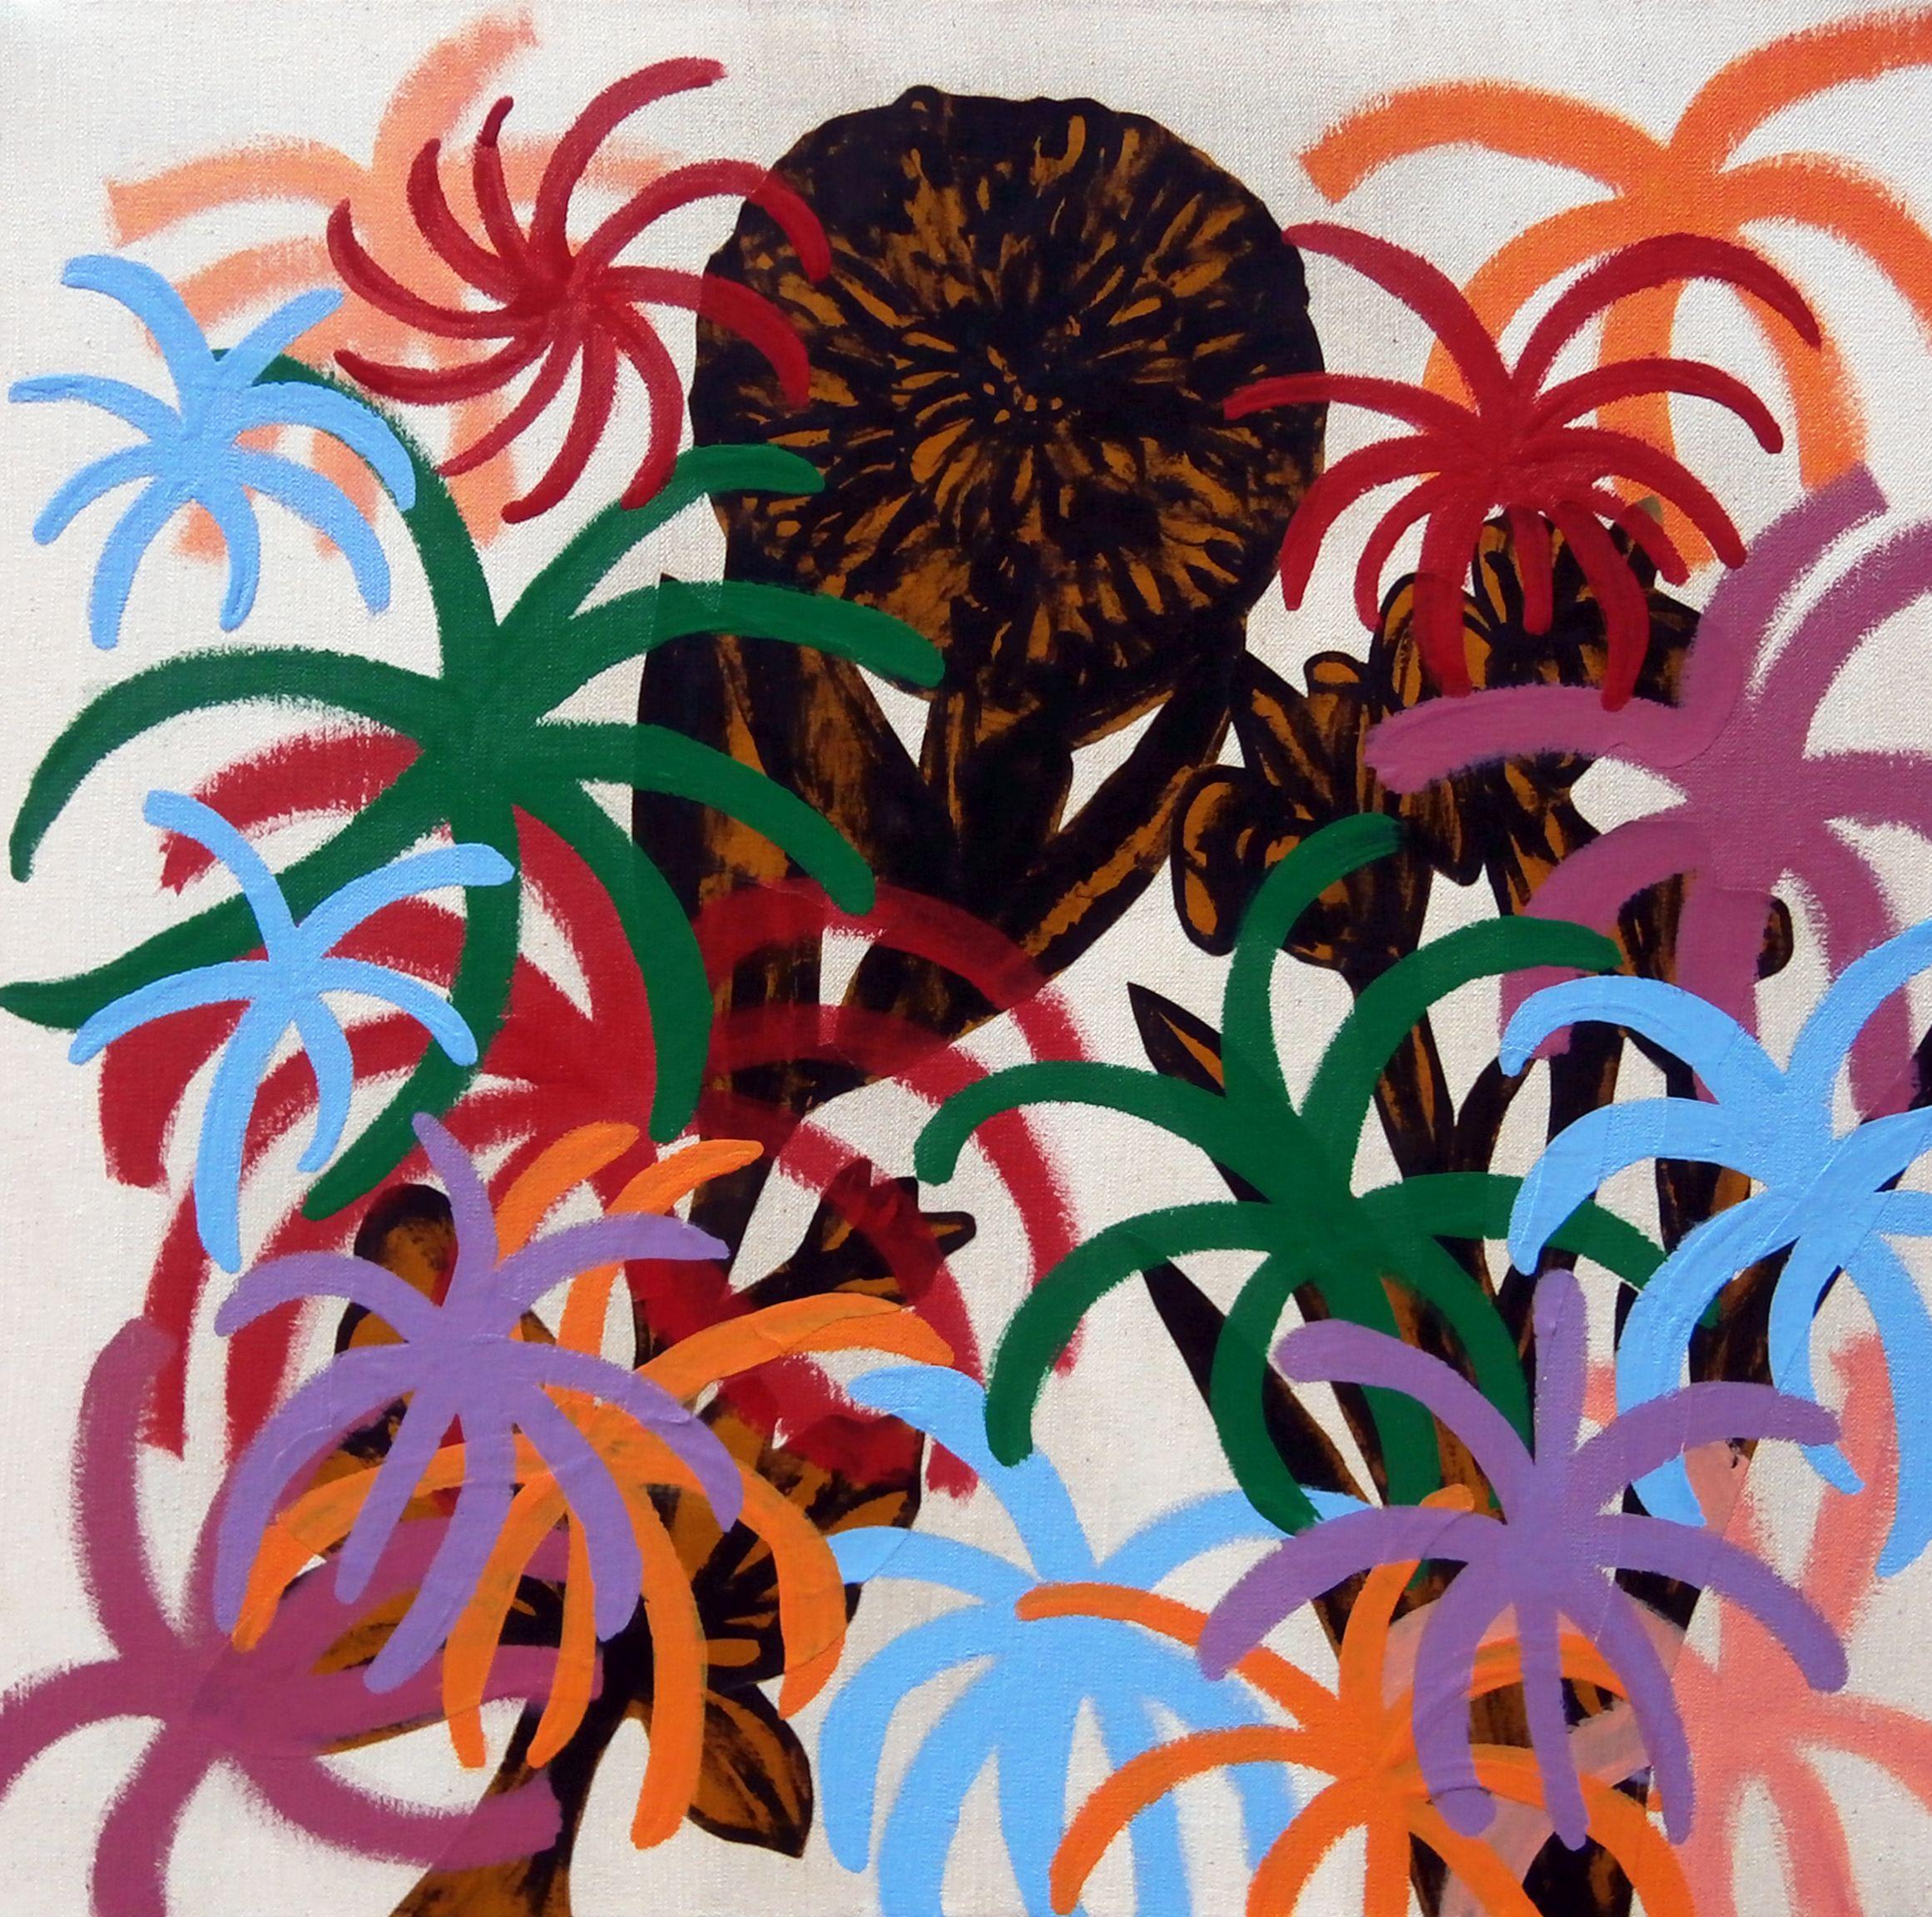 Michael Rotondi, Still Life, 2016, tecnica mista su tela, 50x50 cm